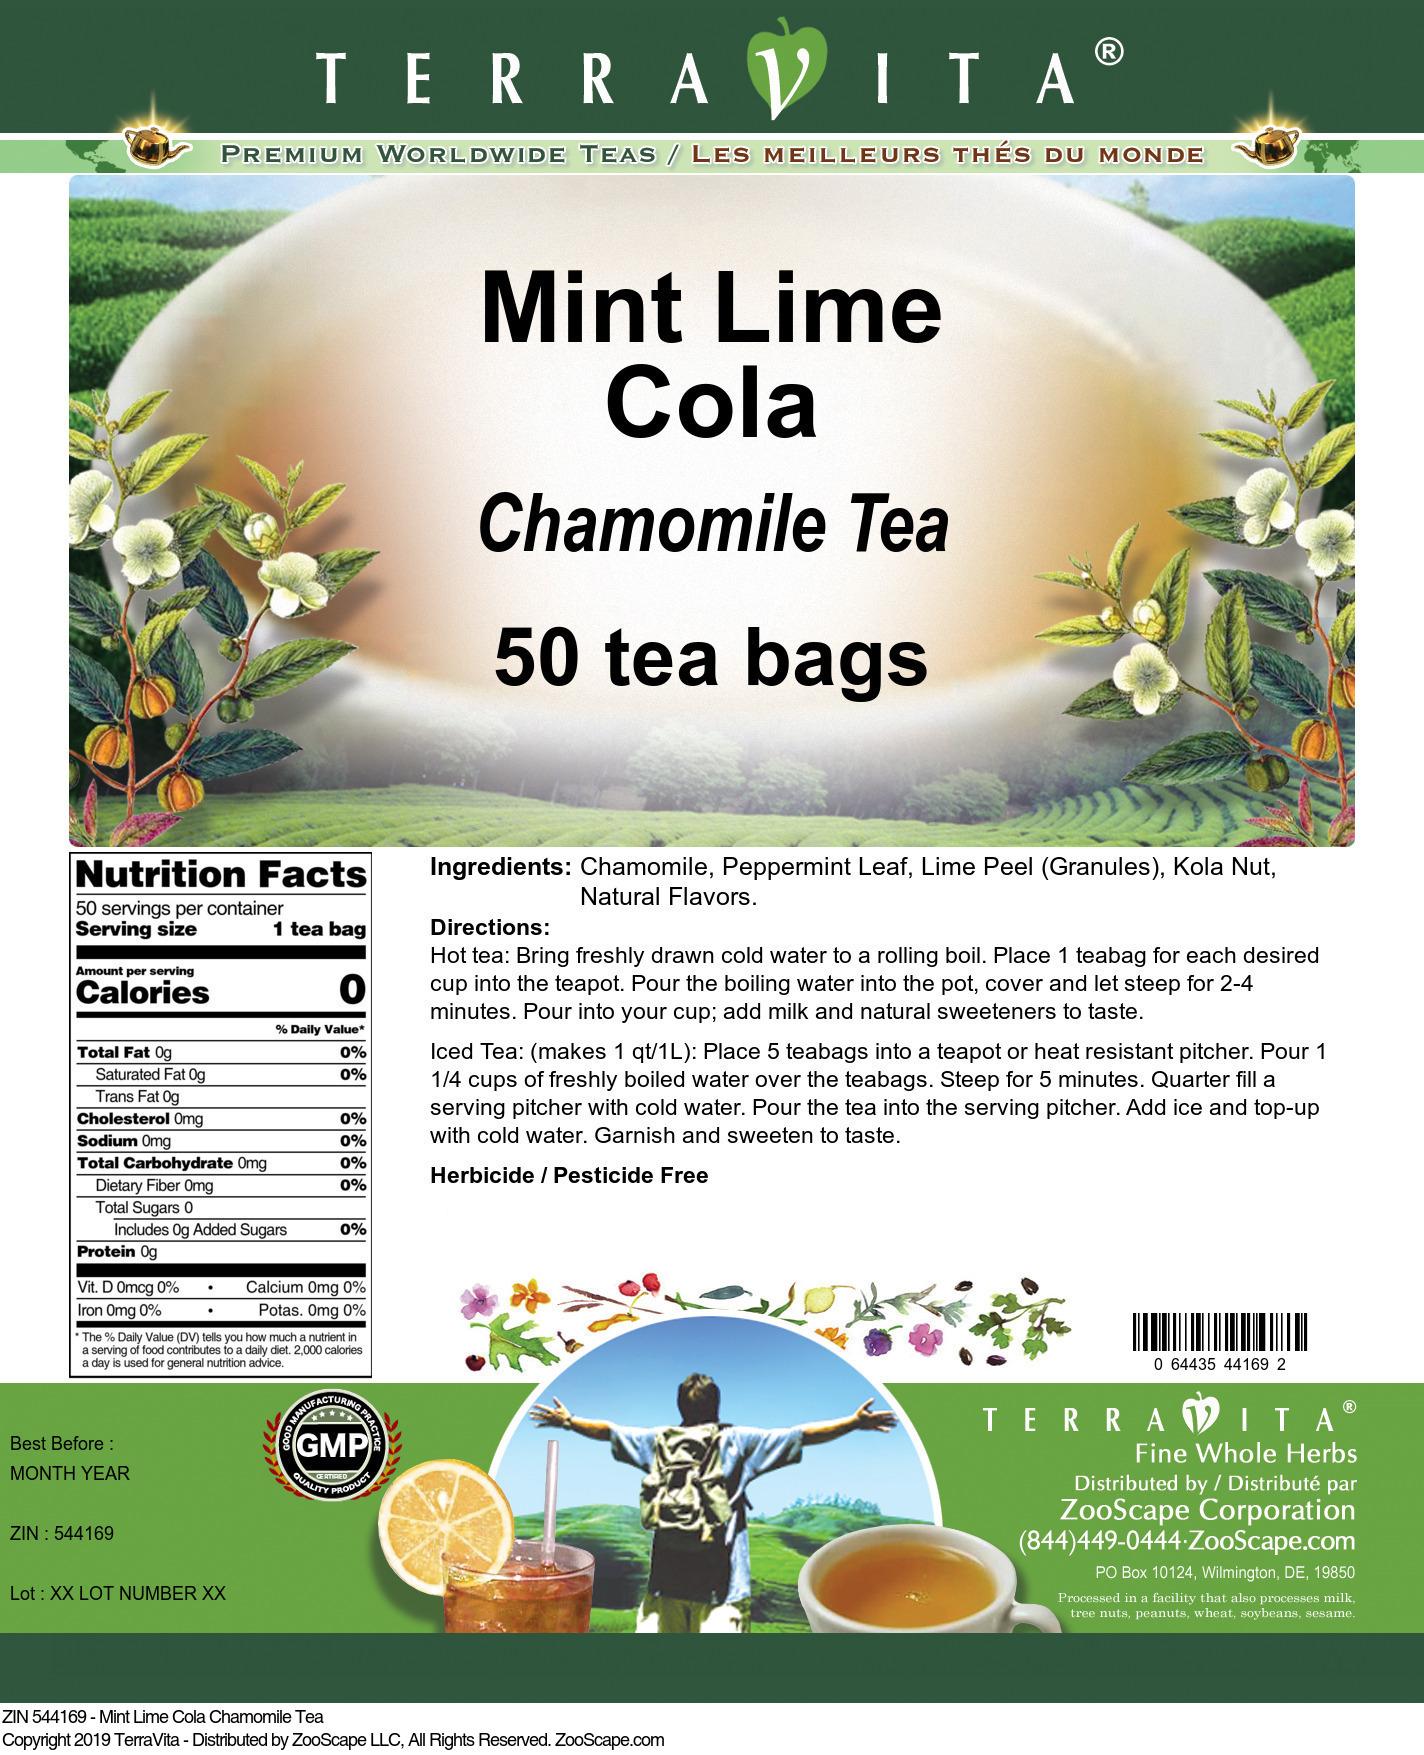 Mint Lime Cola Chamomile Tea